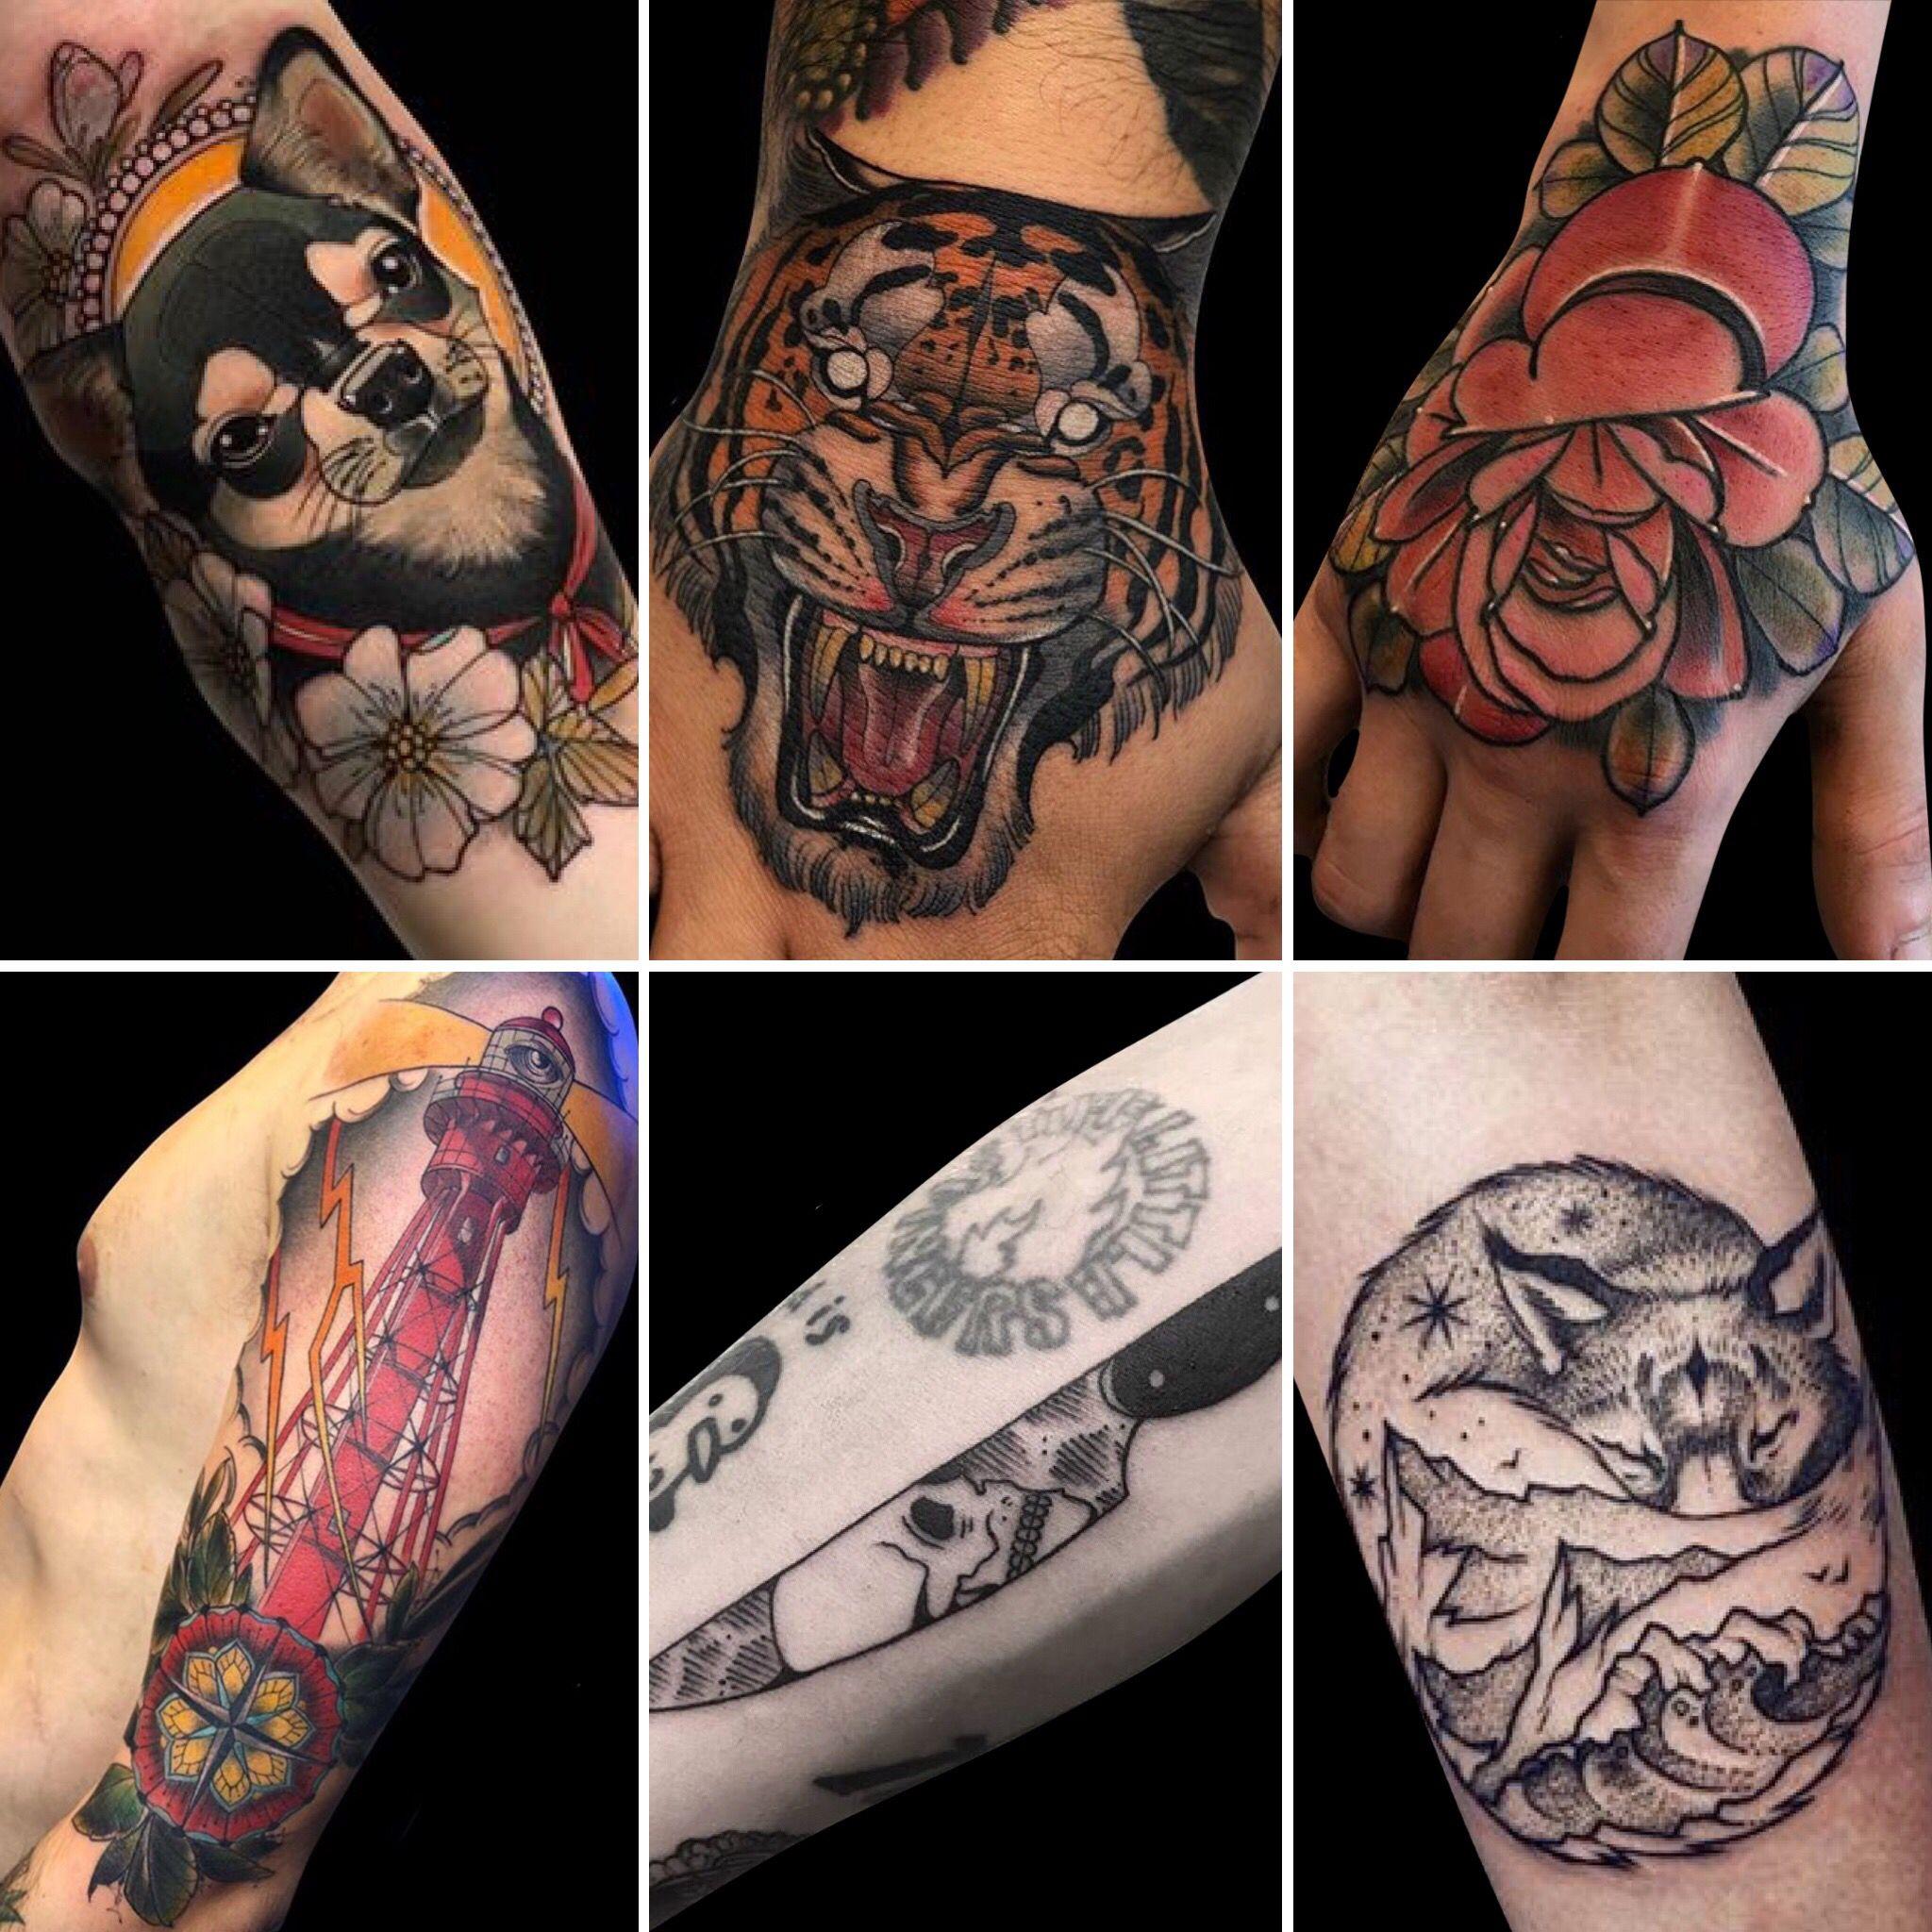 Camden Piercing Tattoo Camdenpiercingandtattoo Instagram Photos And Videos Tattoos Piercing Tattoo Piercing